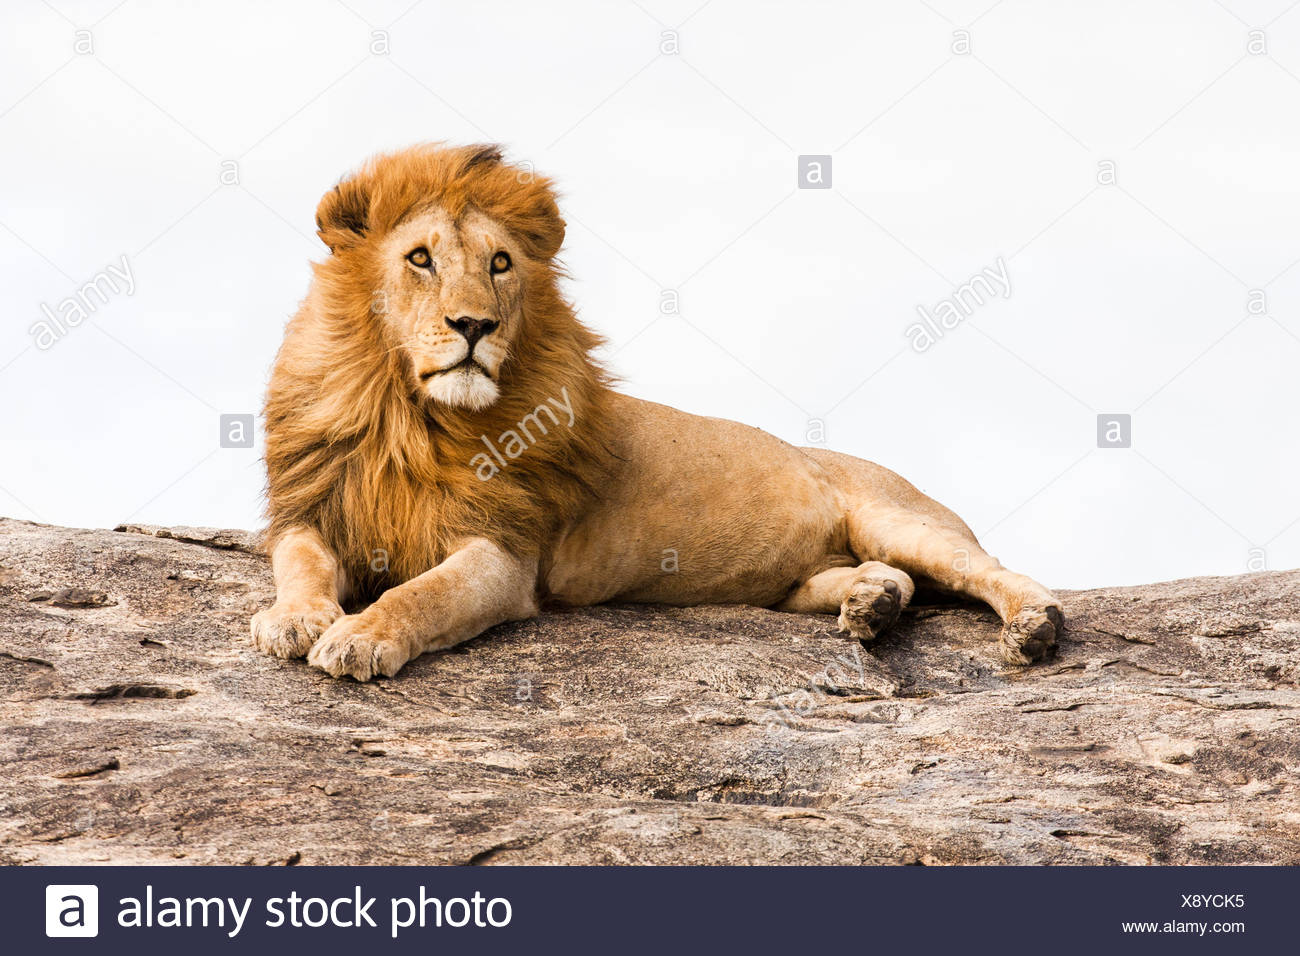 Löwe (Panthera Leo) auf einem Felsbrocken fotografiert in Tansania Stockbild